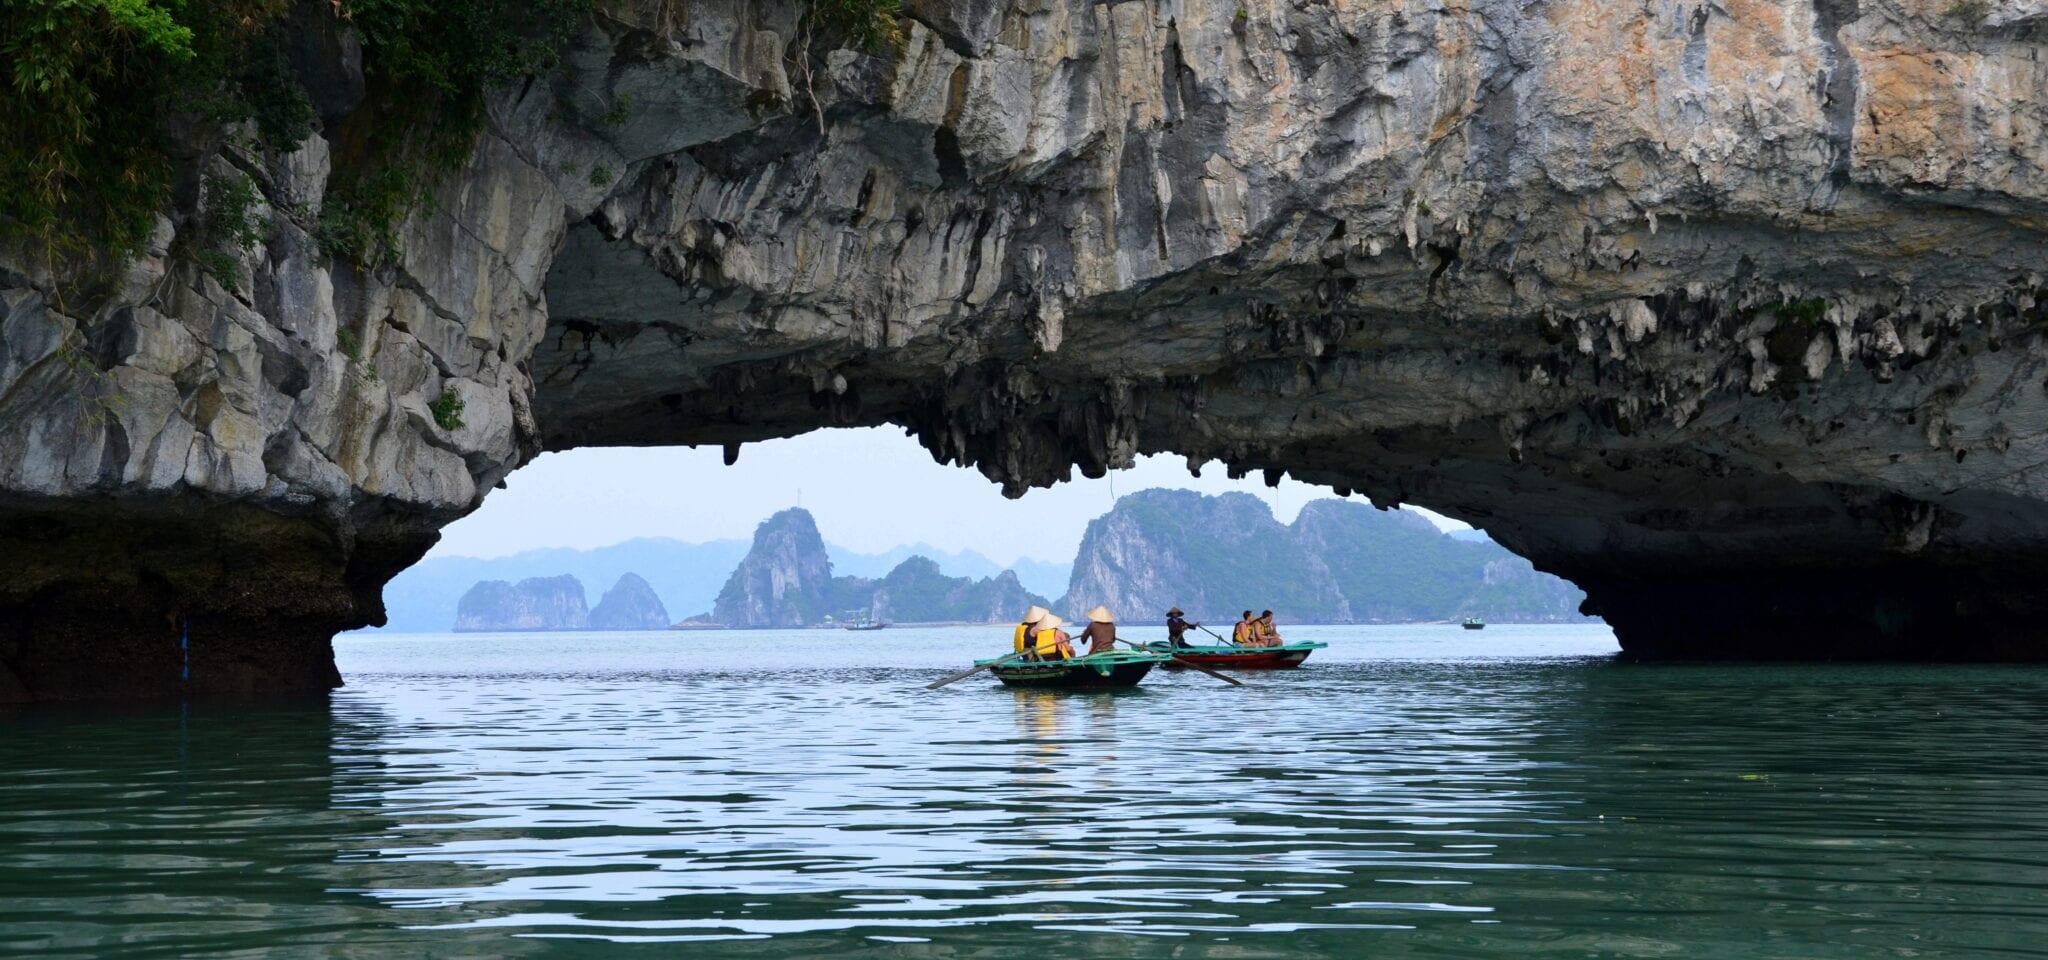 Seaside Cave in Bai Tu Long National Park Vietnam